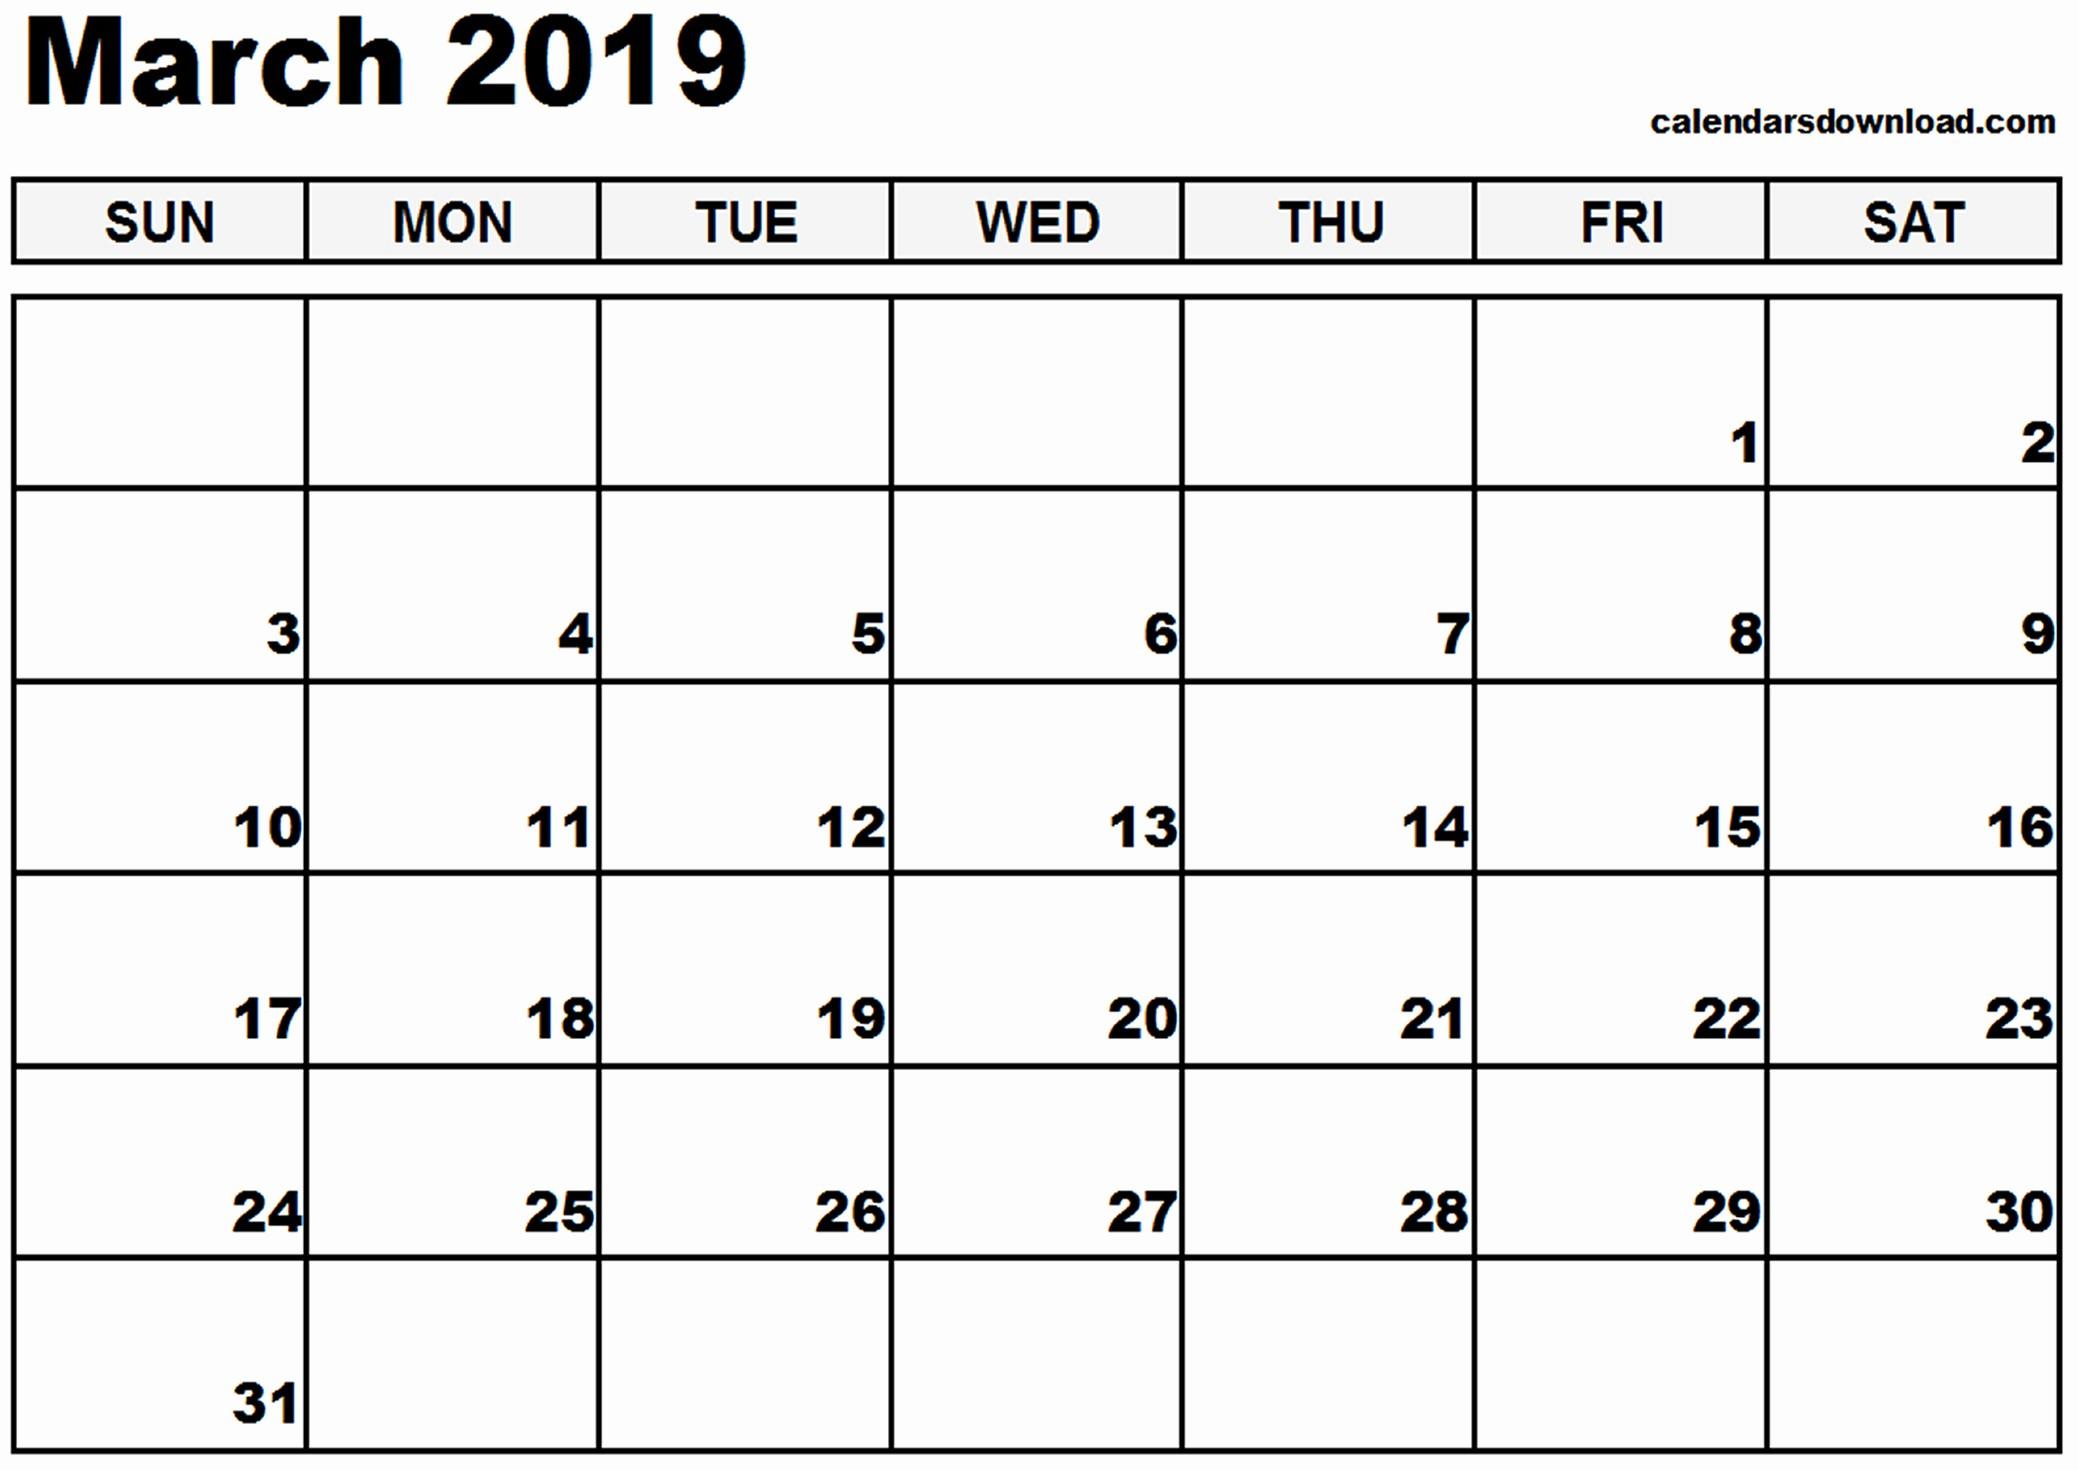 March Calendar Canada Actual January 2019 Calendar Canada Printable Of March Calendar Canada Más Recientes Flowers March 2019 Desktop Calendar March March2019